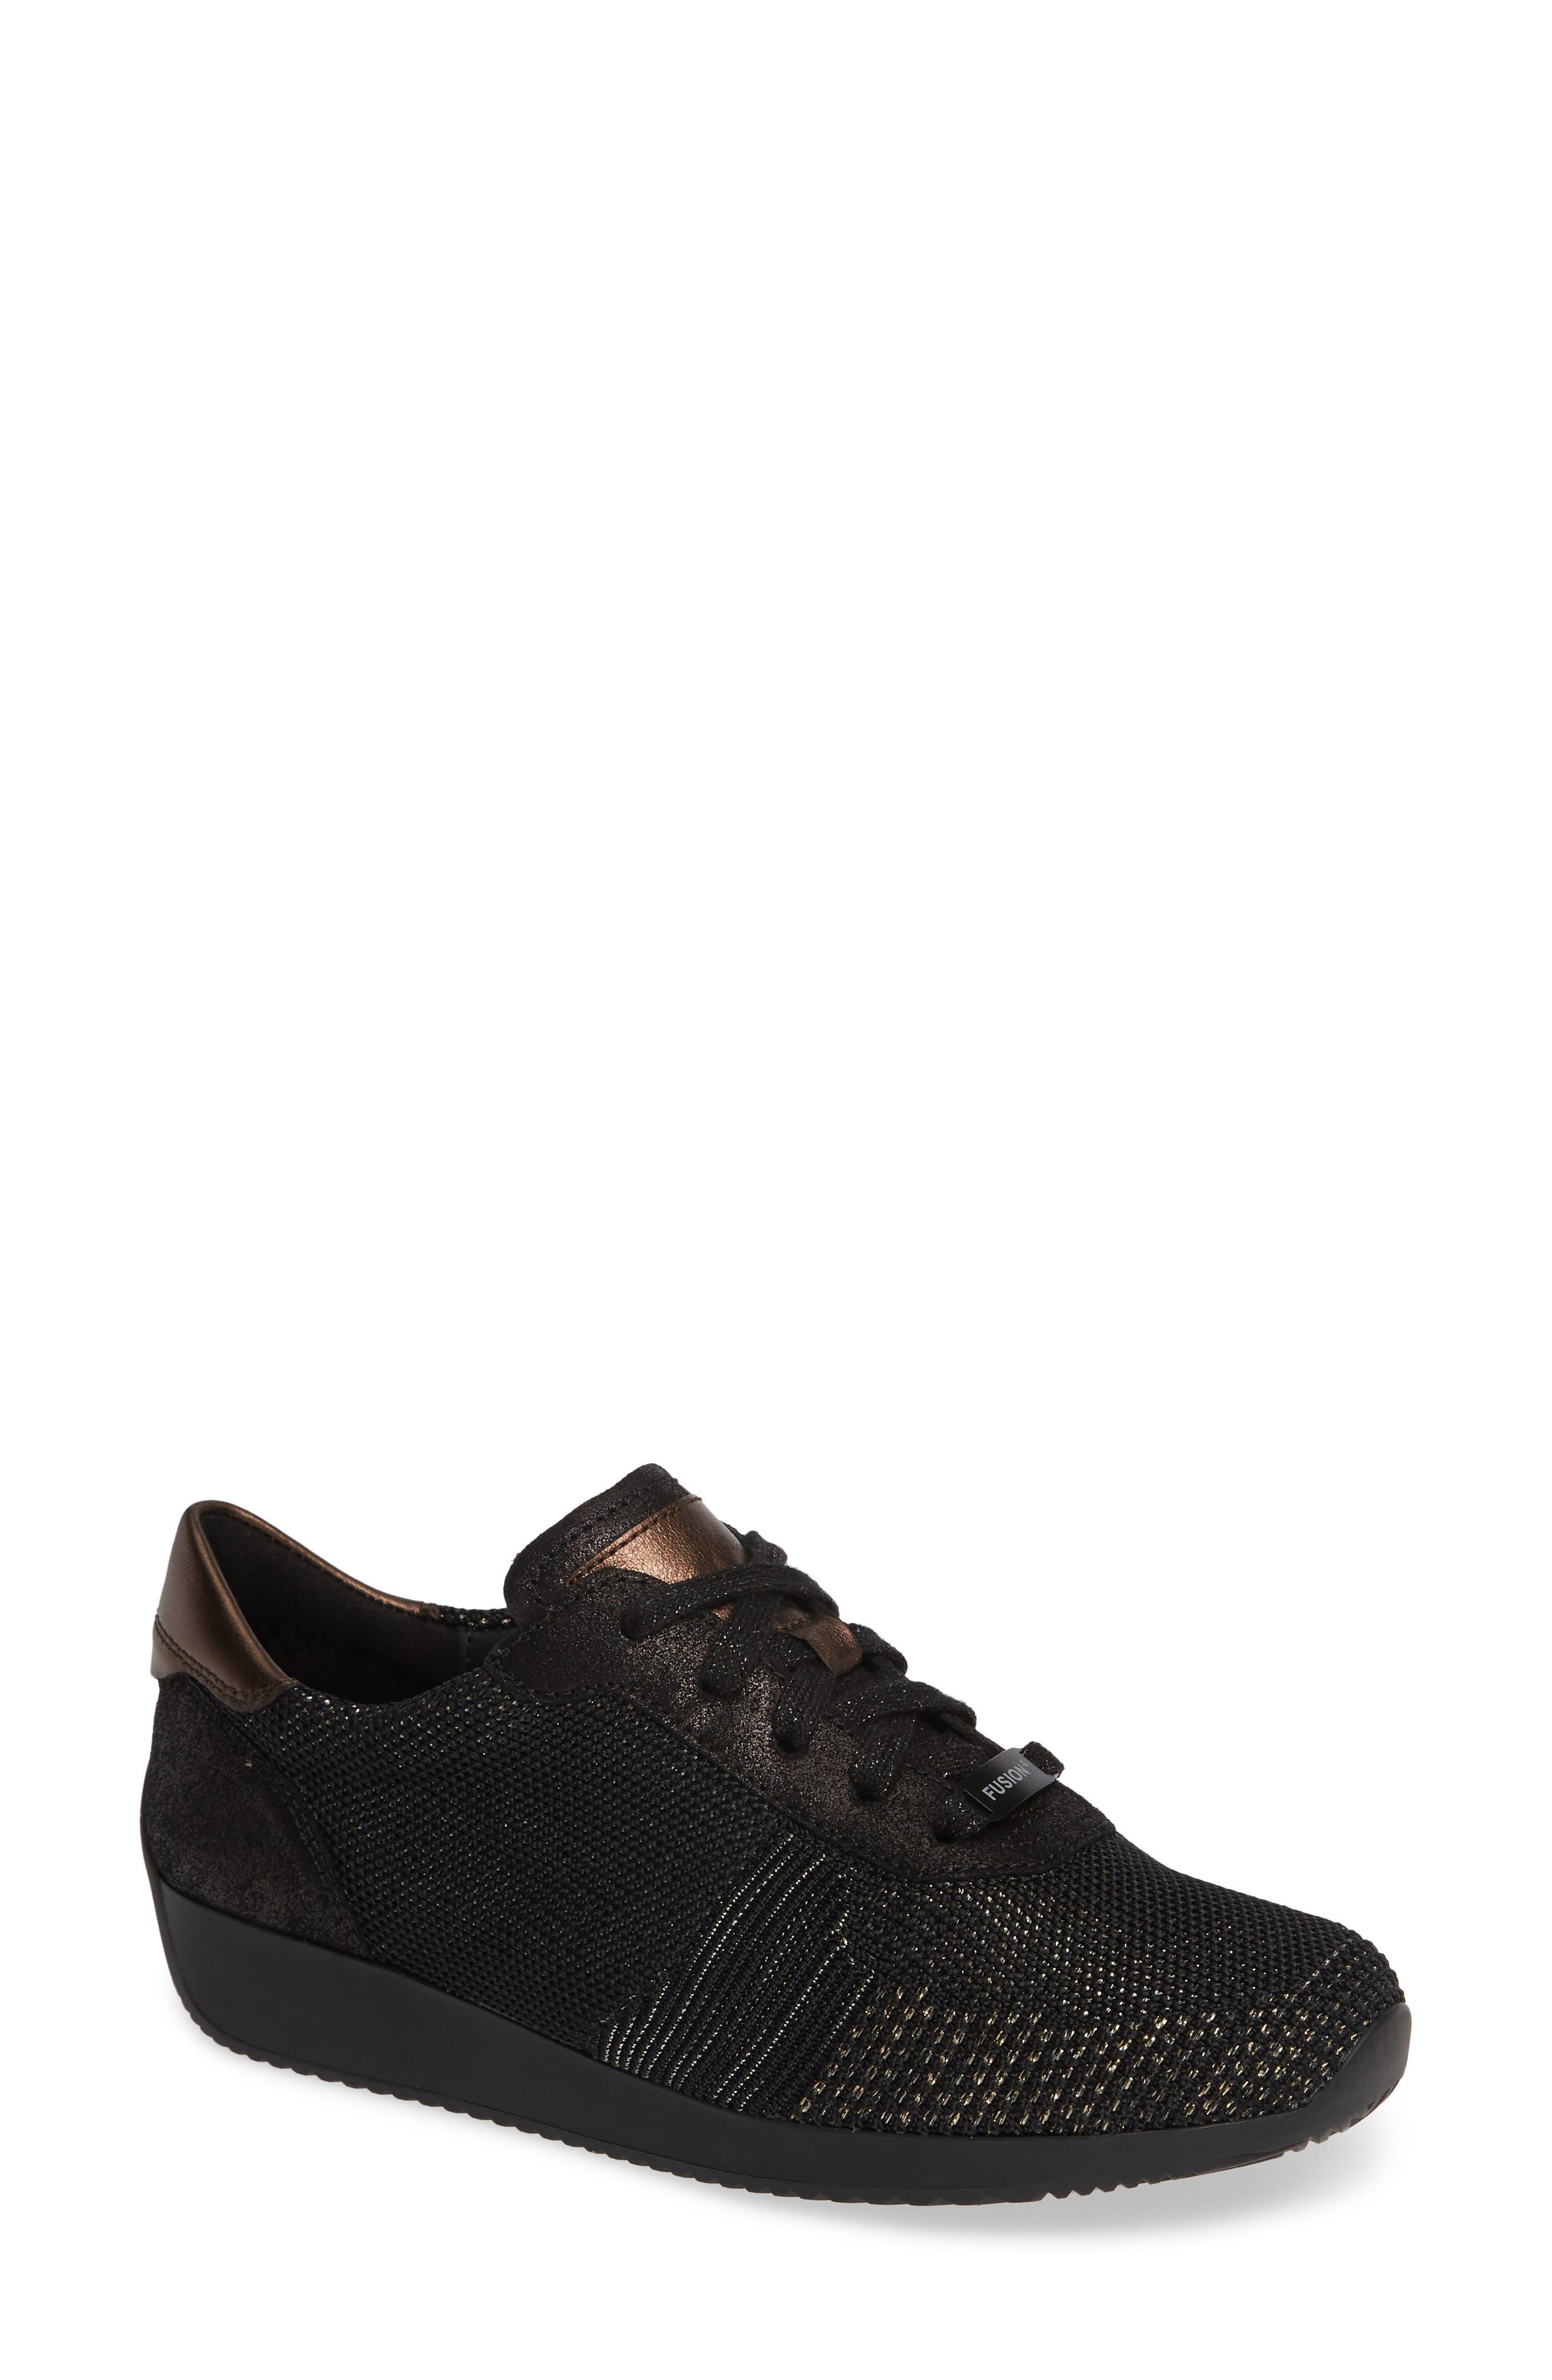 Ara Lilly Sneaker- Black